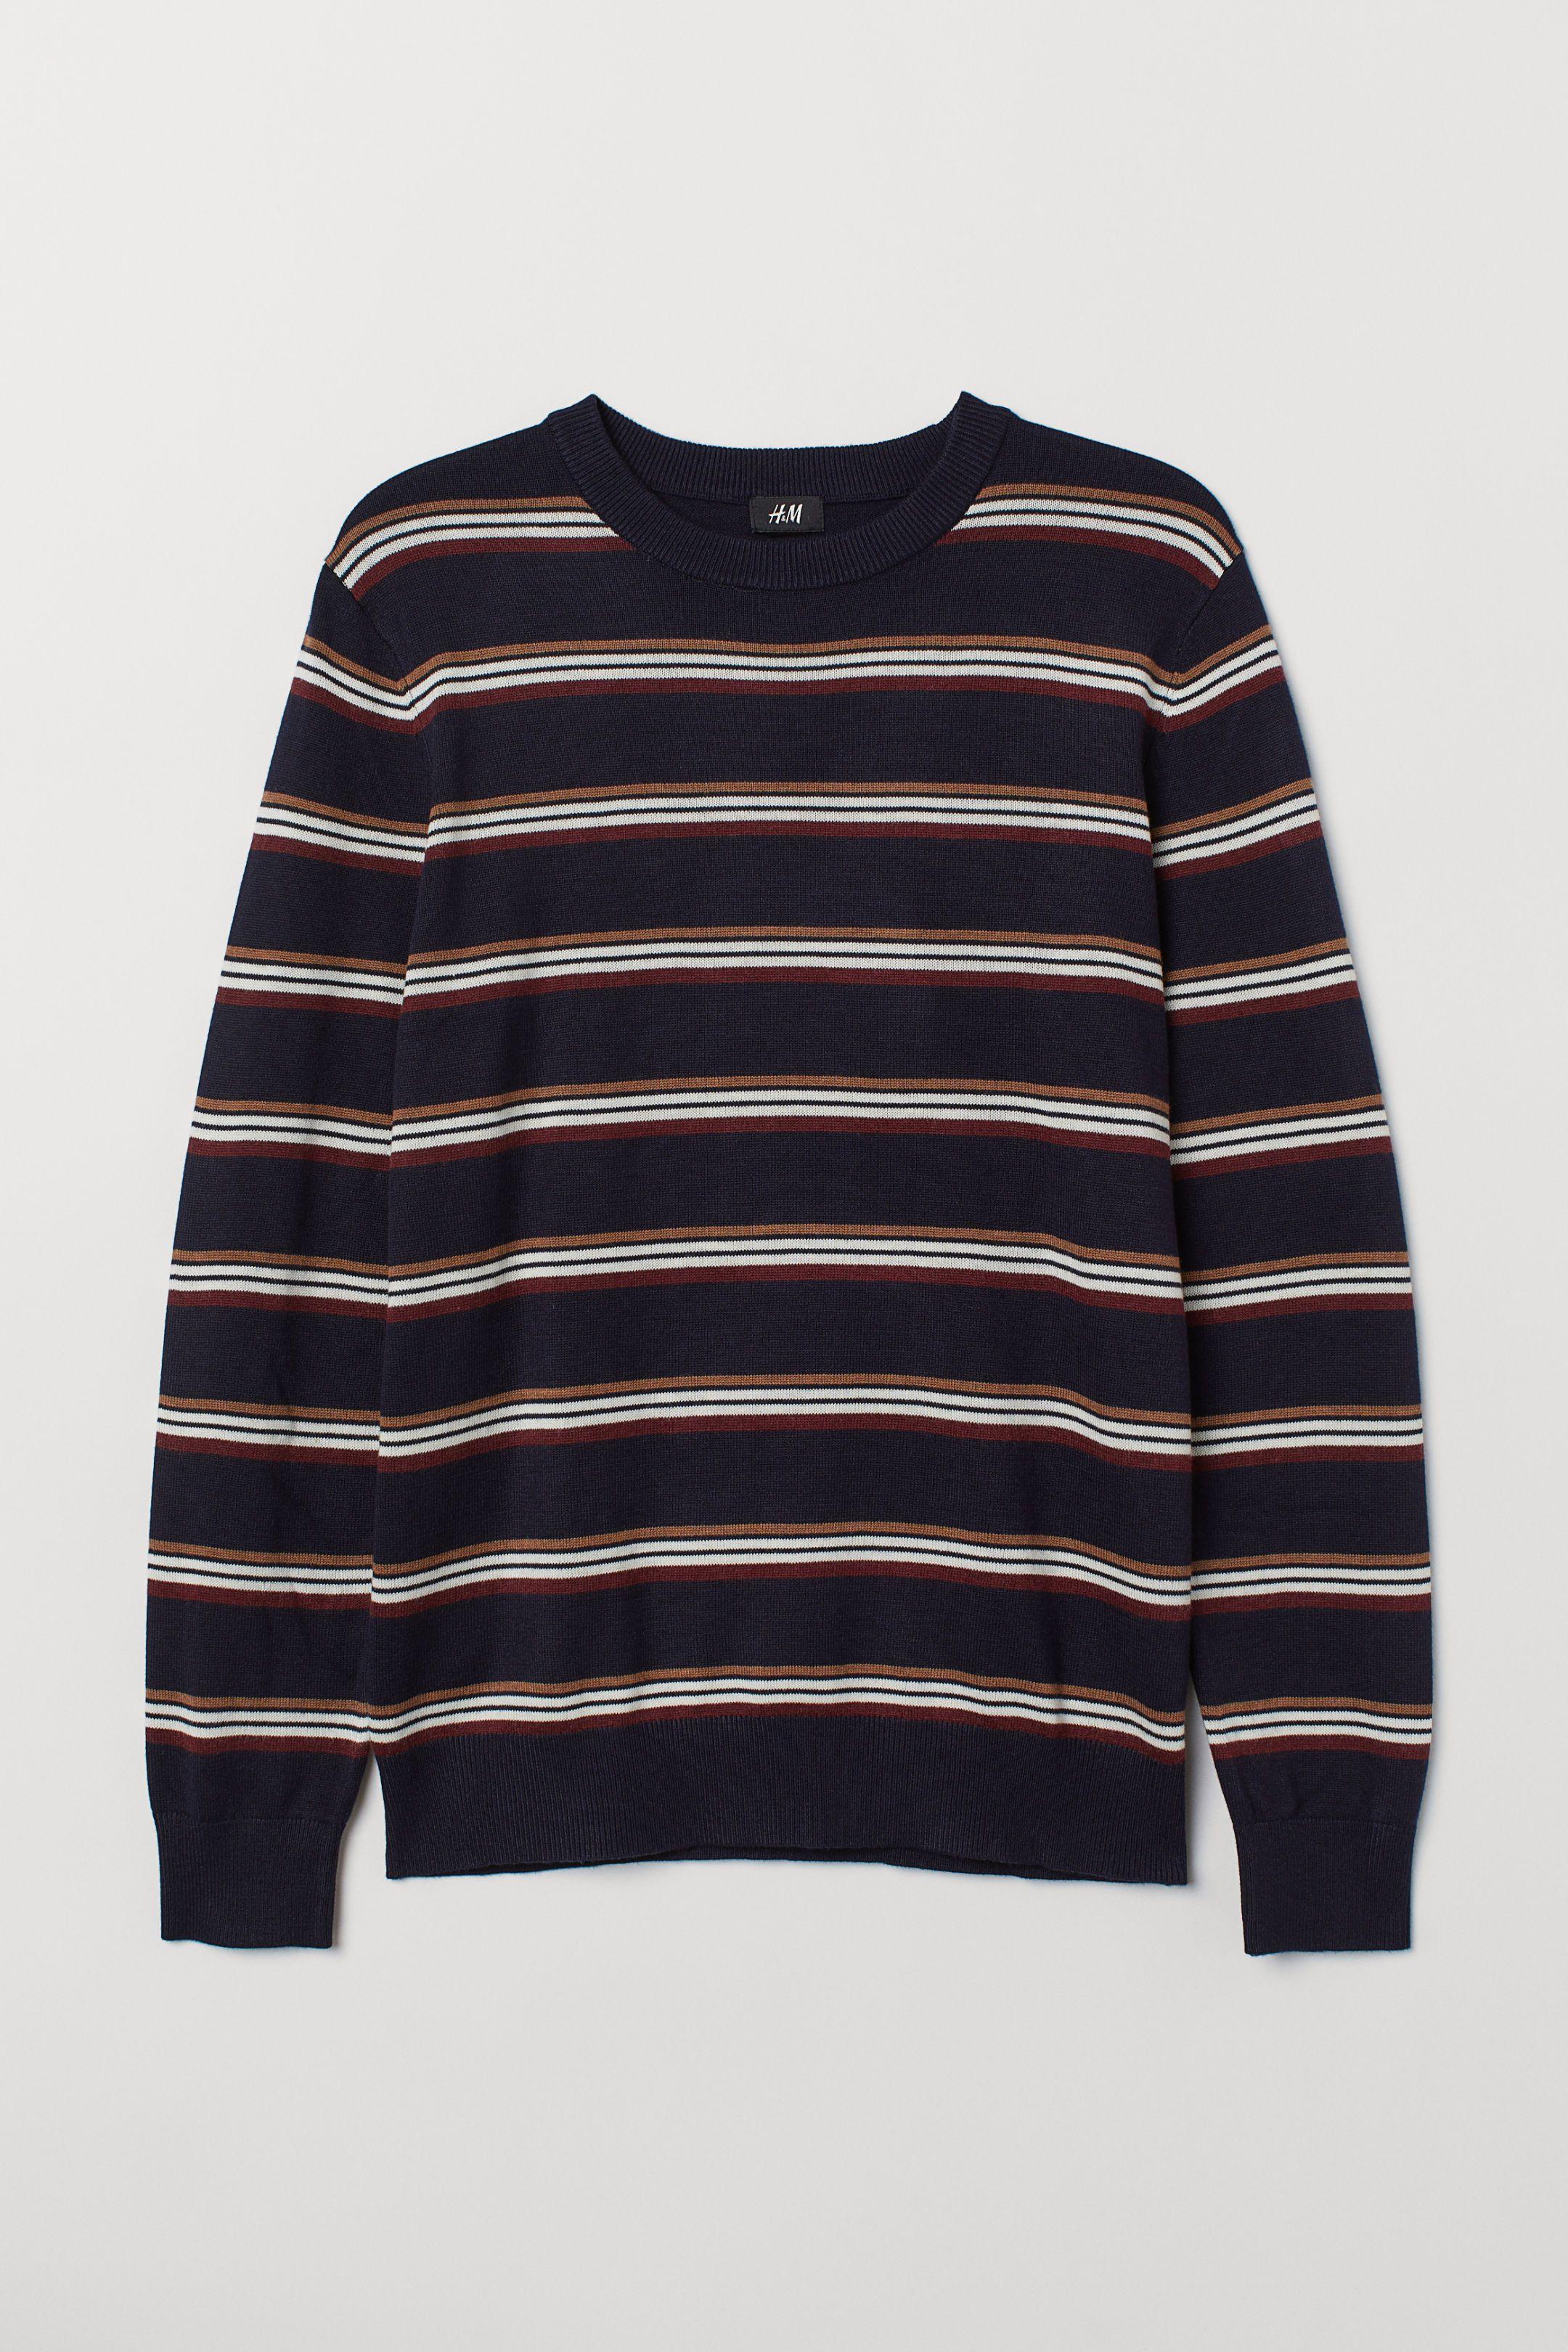 H&m Jumper Kent R-Neck Sweater Blue Polyamid/visko